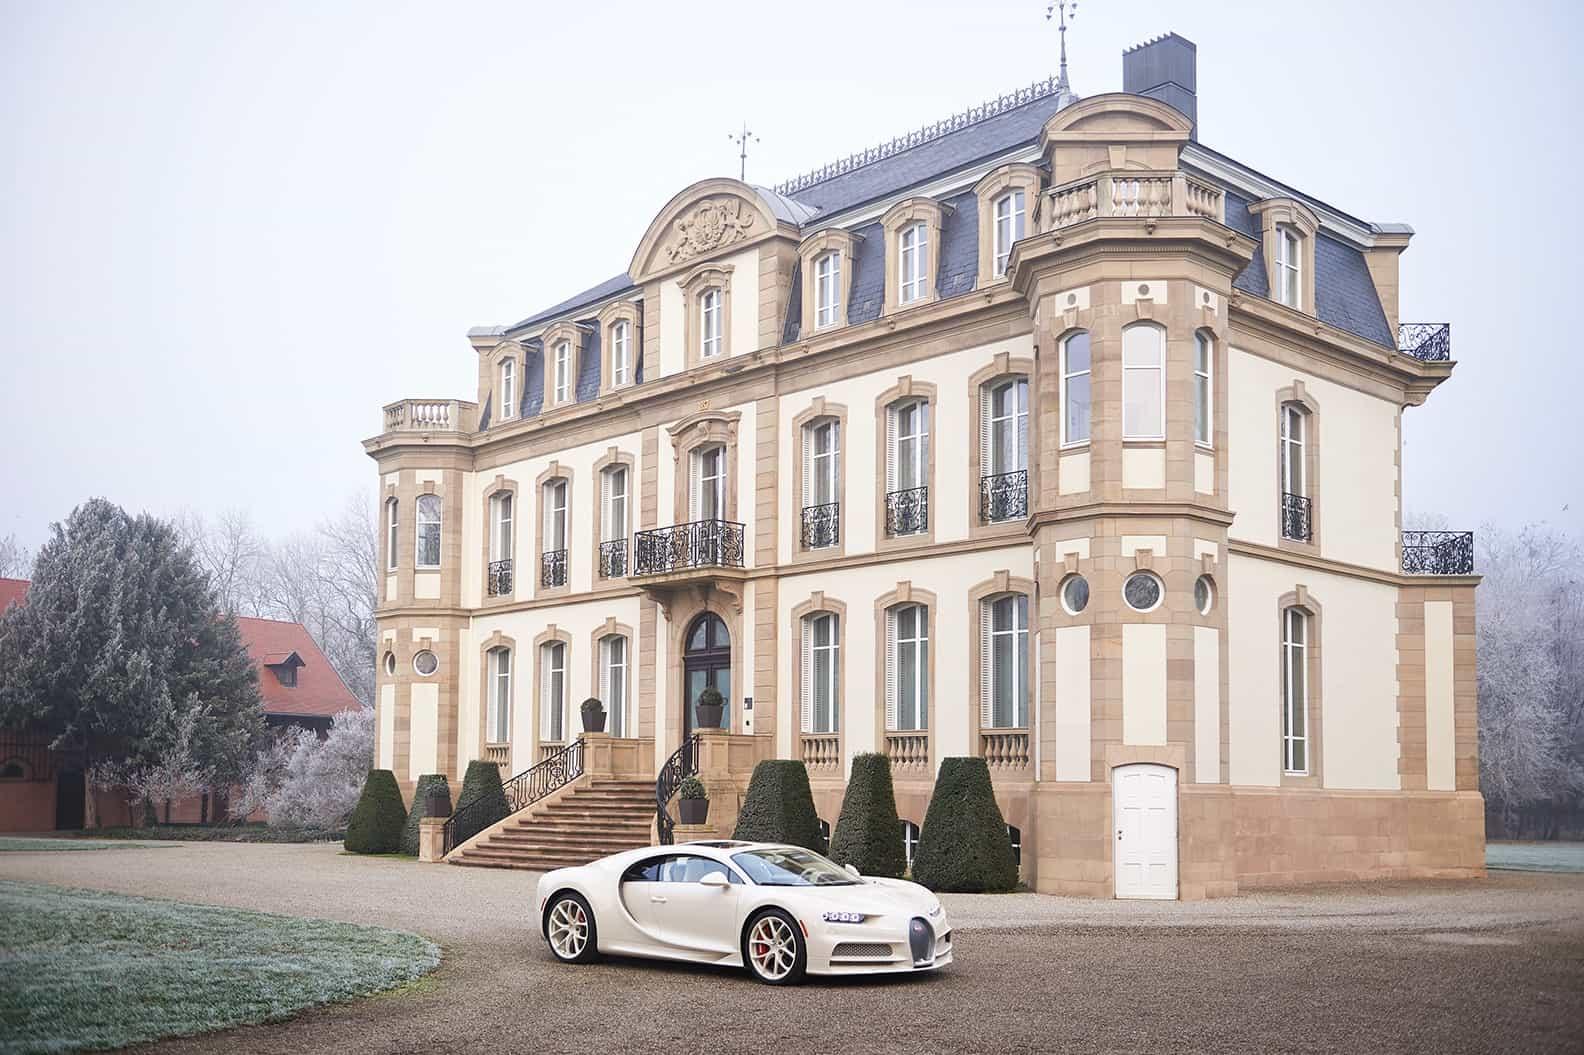 Manny Khoshbin's One-Off Bugatti Chiron Hermès Edition is Beyond Stunning!